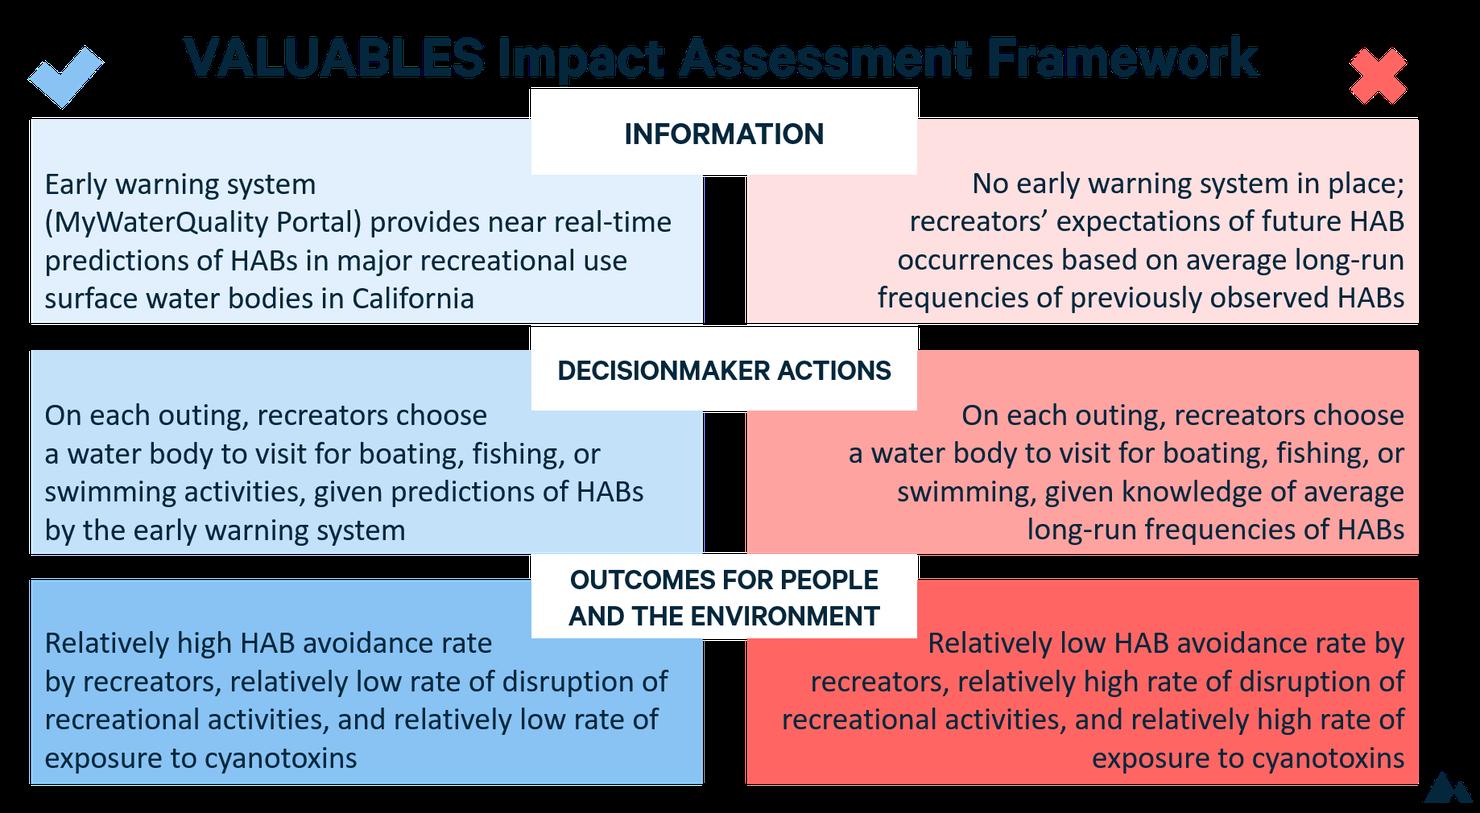 Steve Newbold GABS impact assessment framework